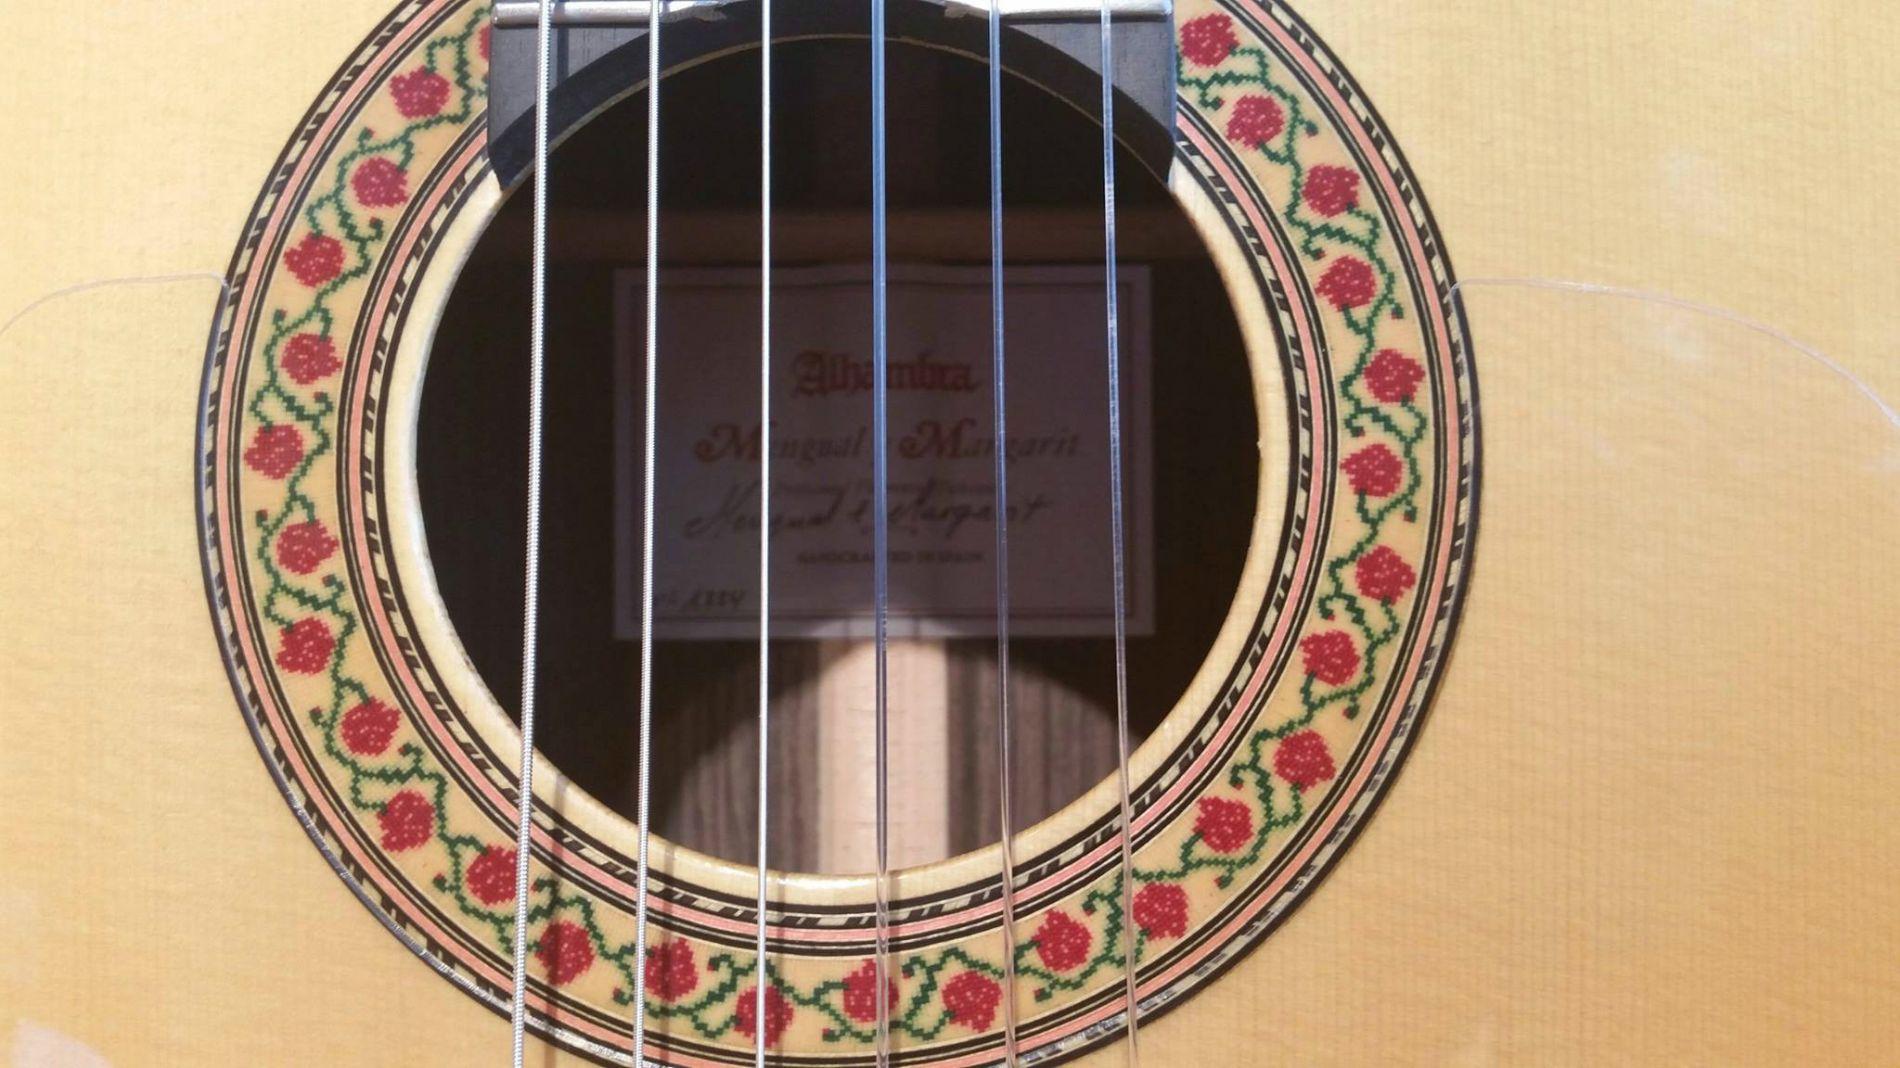 Profile guitars history